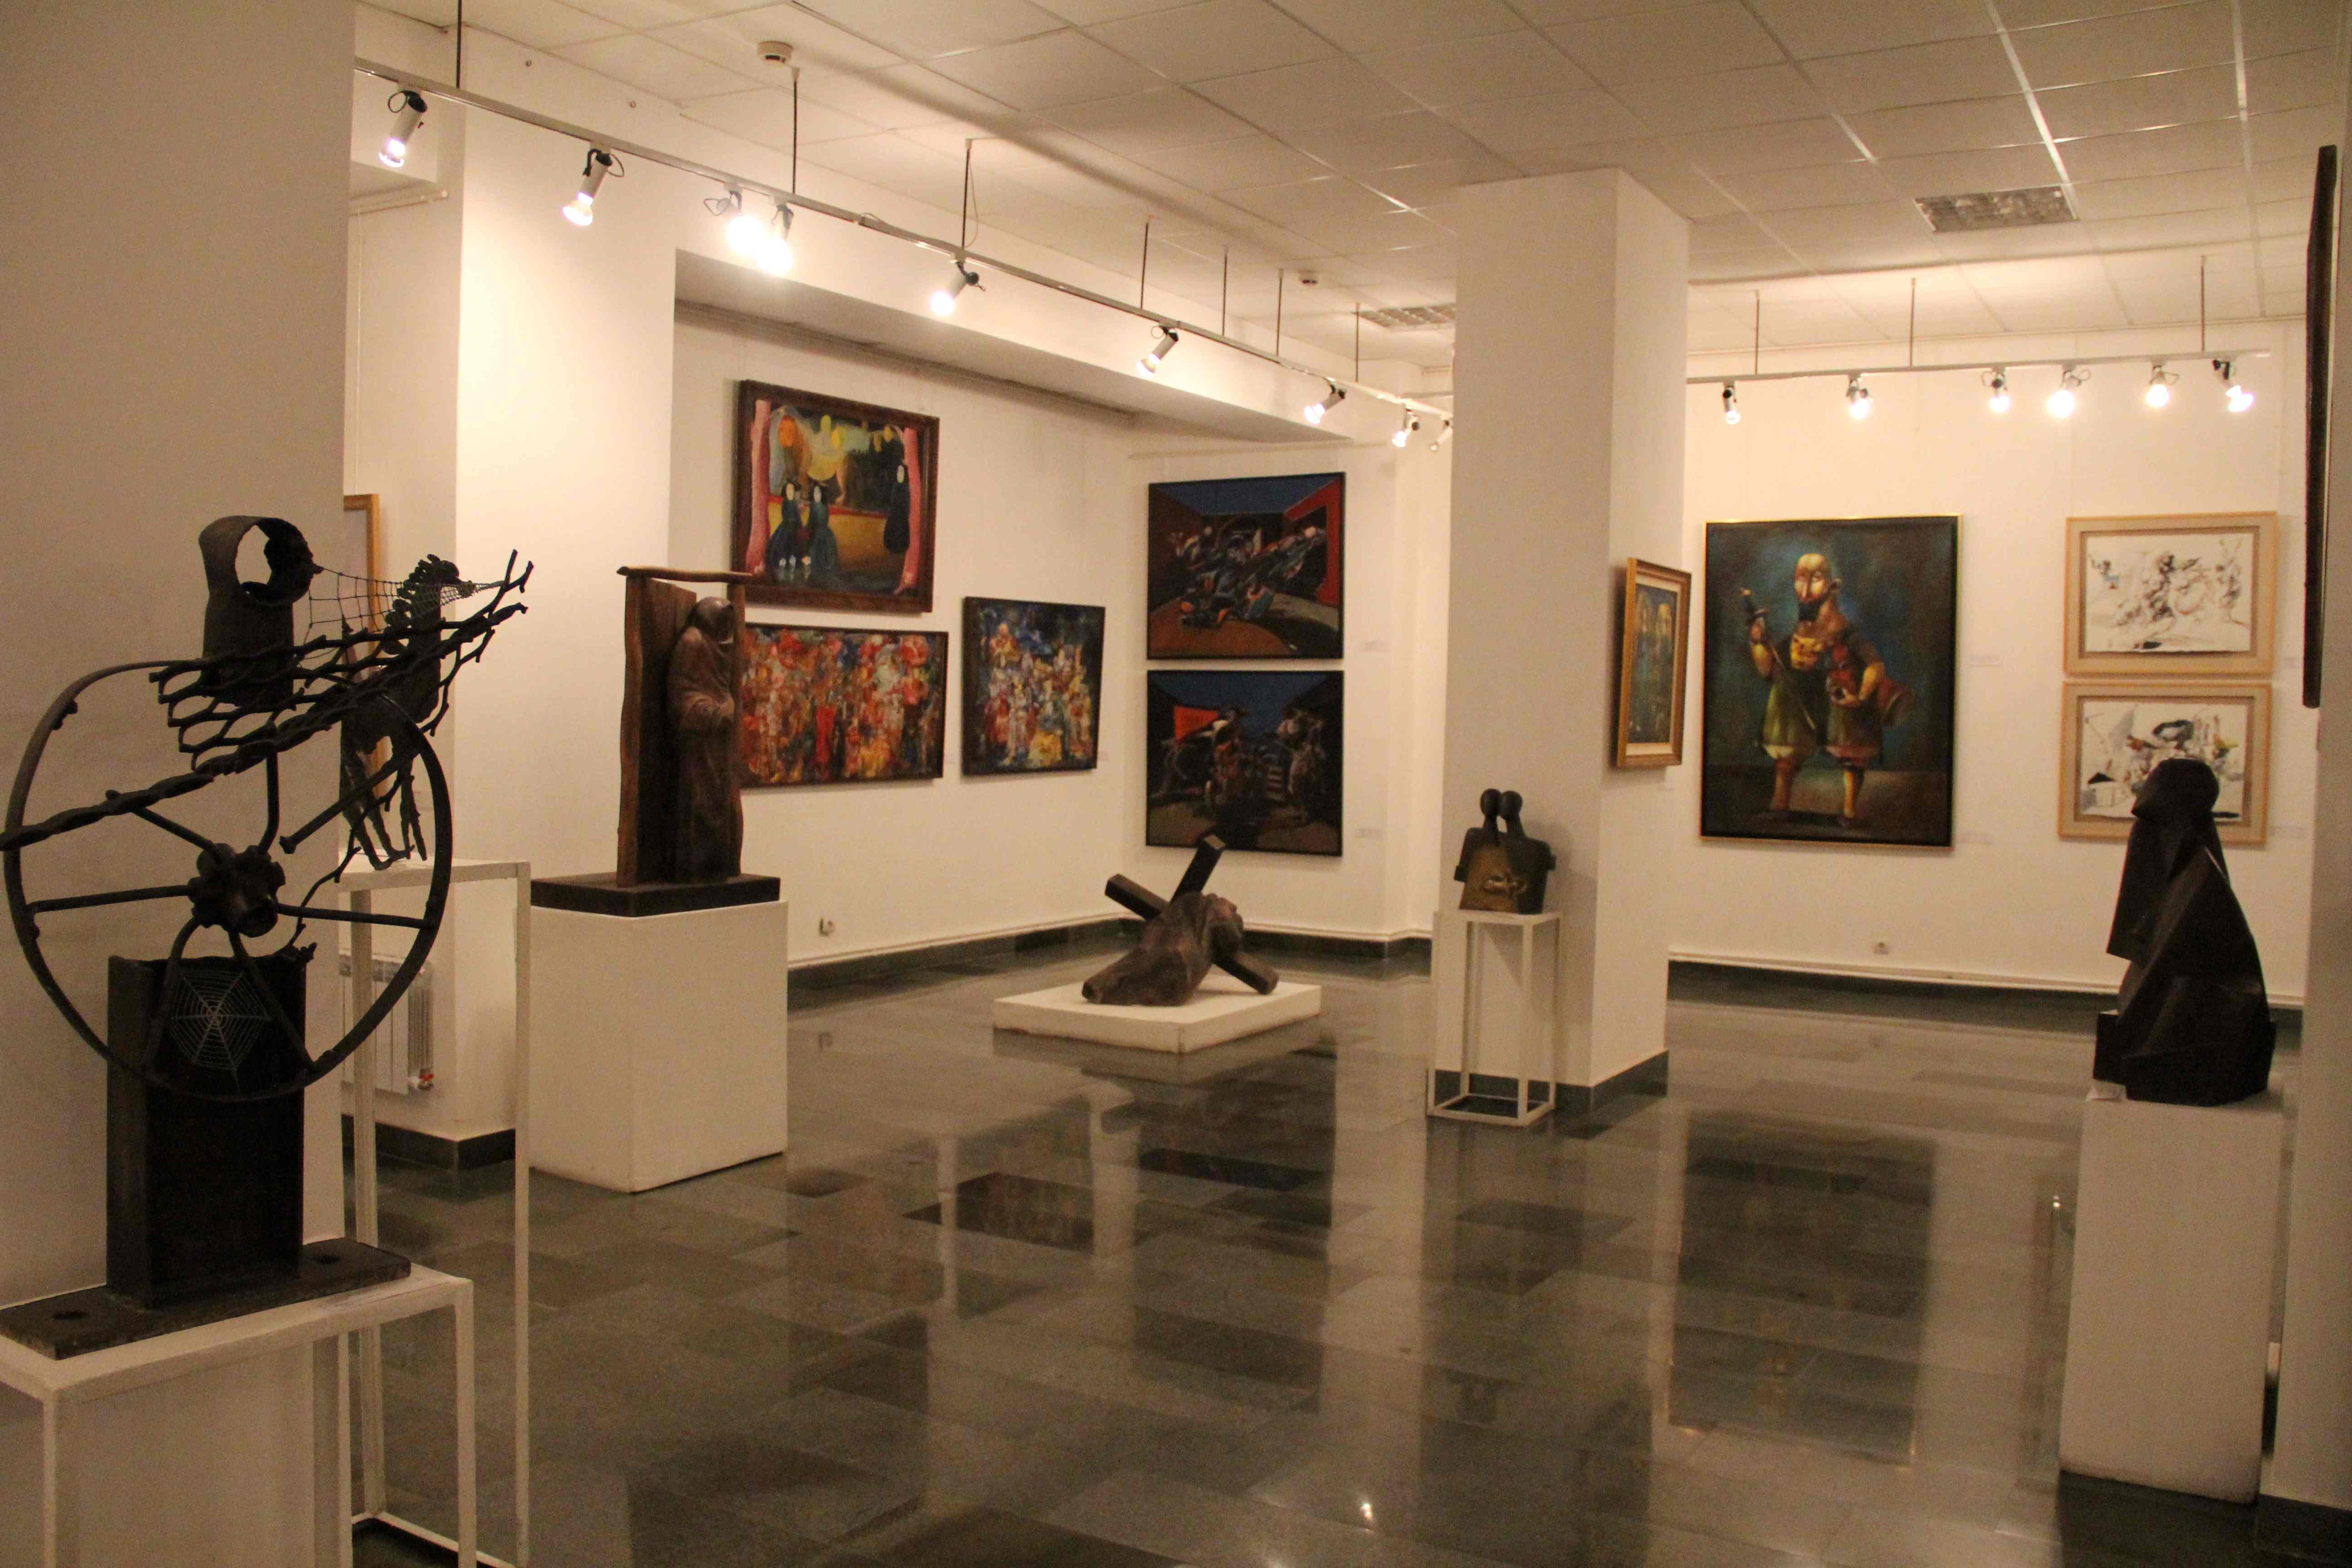 Museum Of Arts And Design Inside : Modern art museum unique cultural center